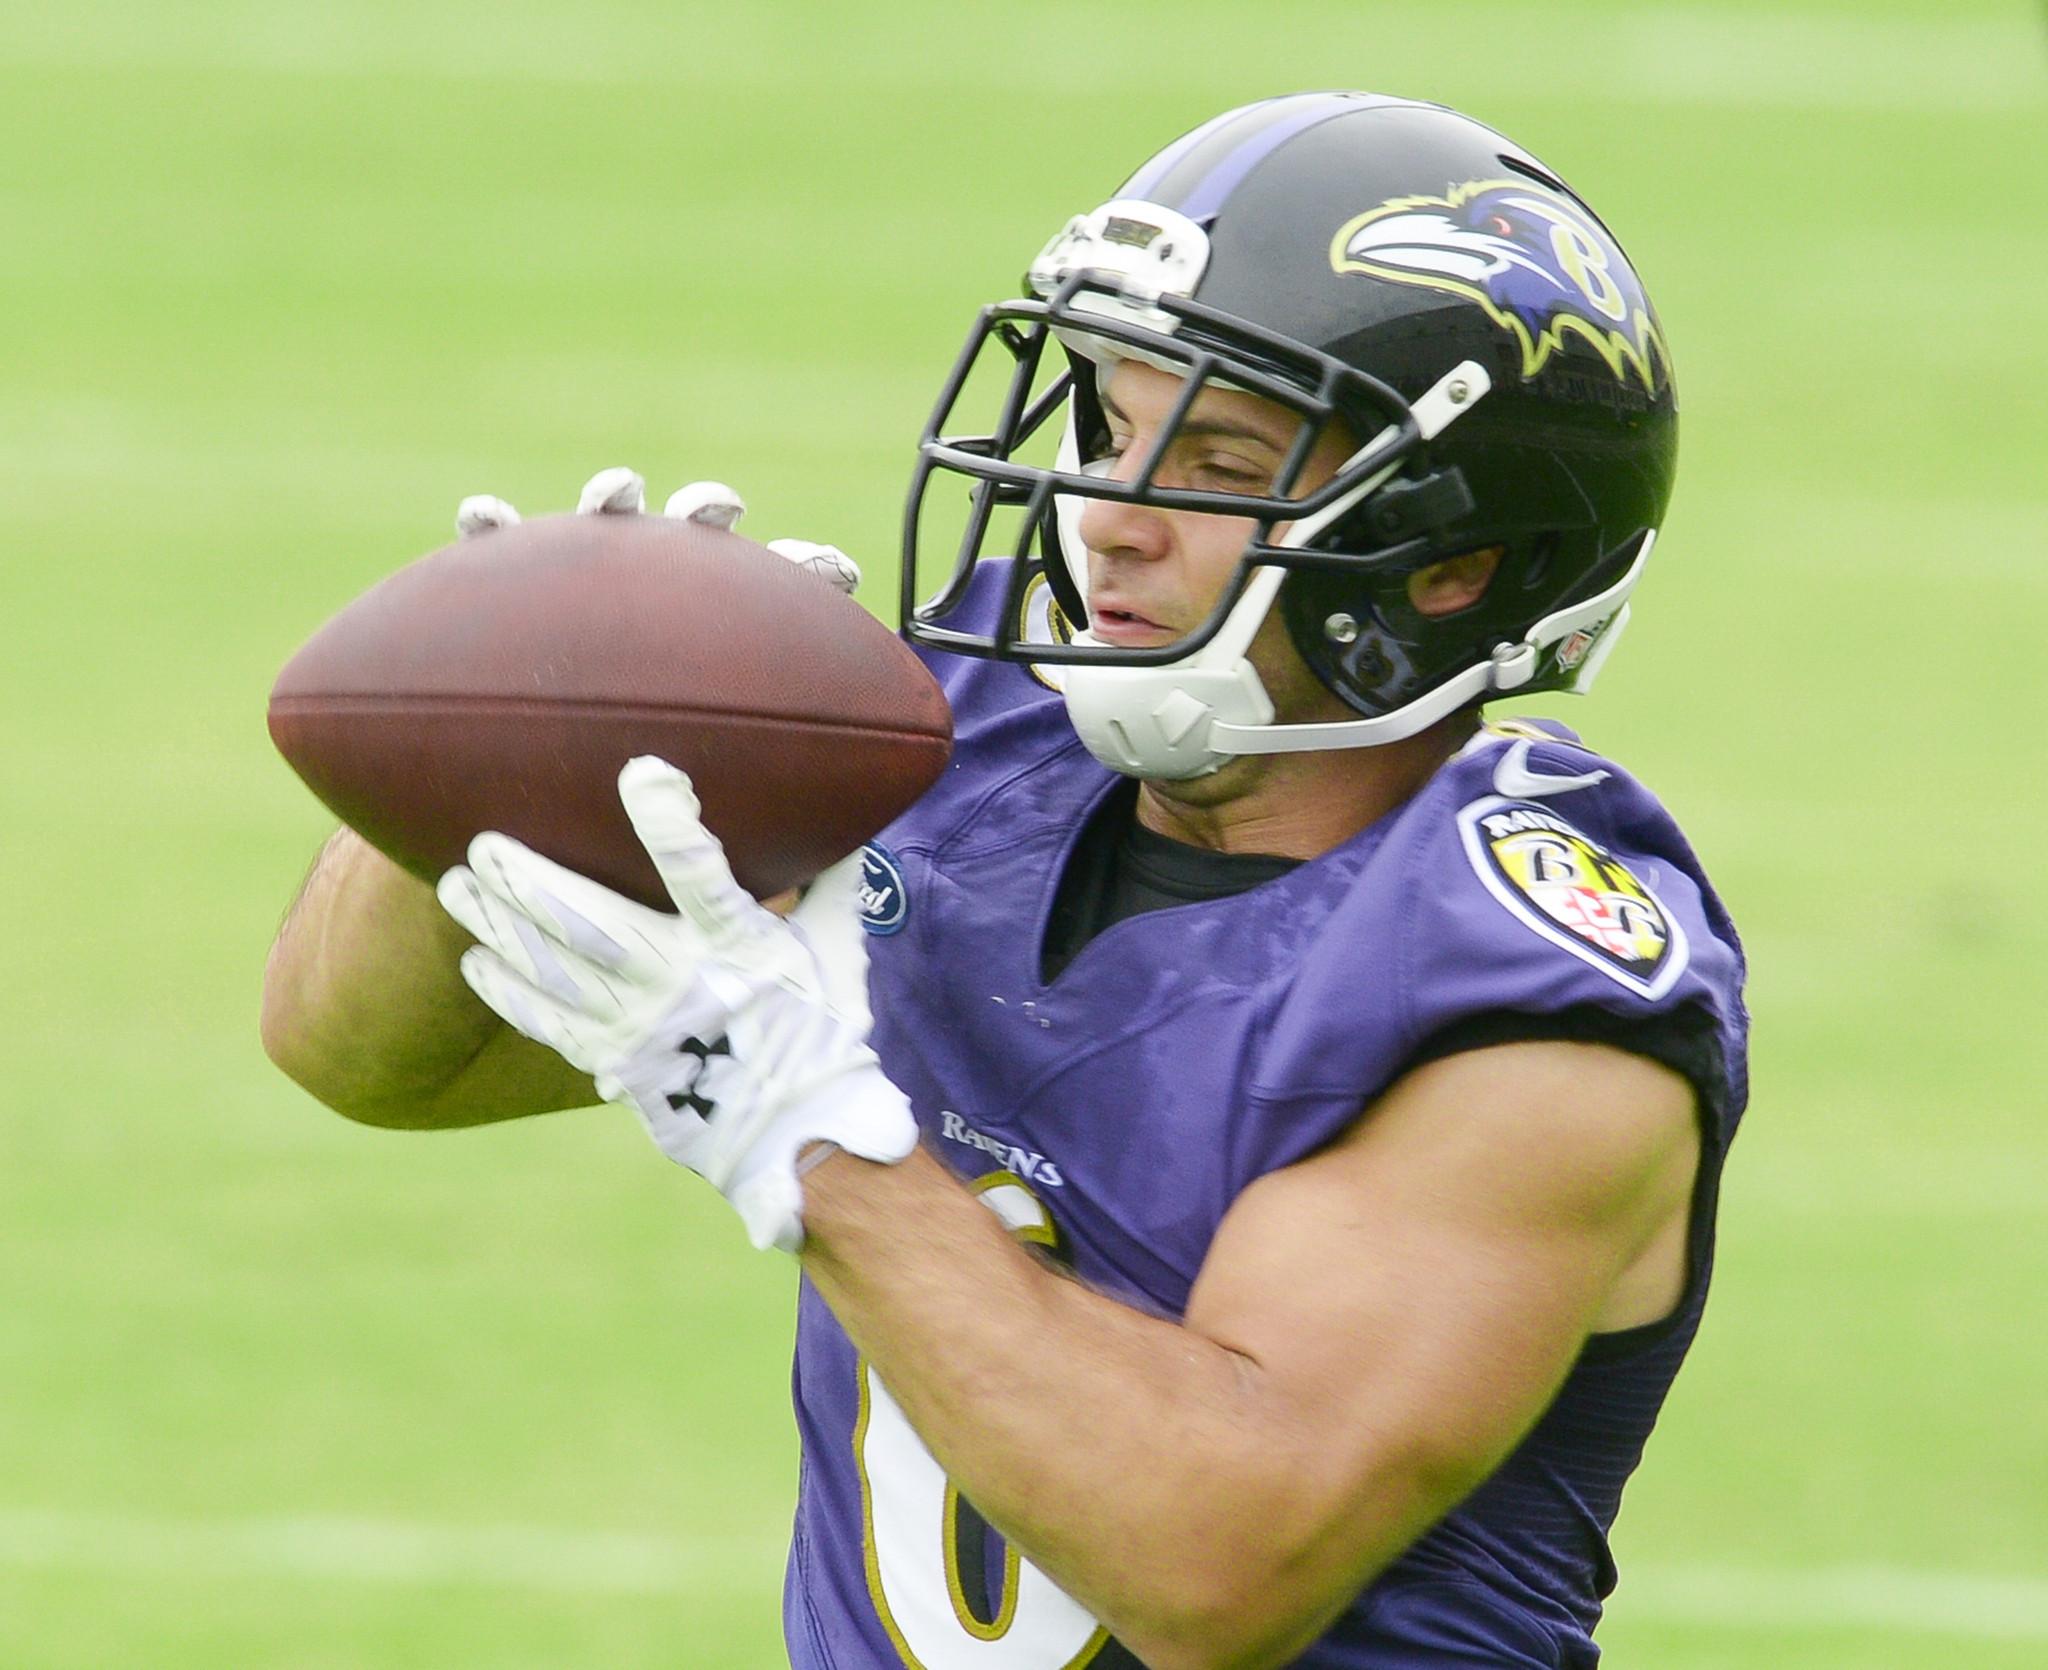 Ravens wide receiver Michael Campanaro, guard Jah Reid return t…